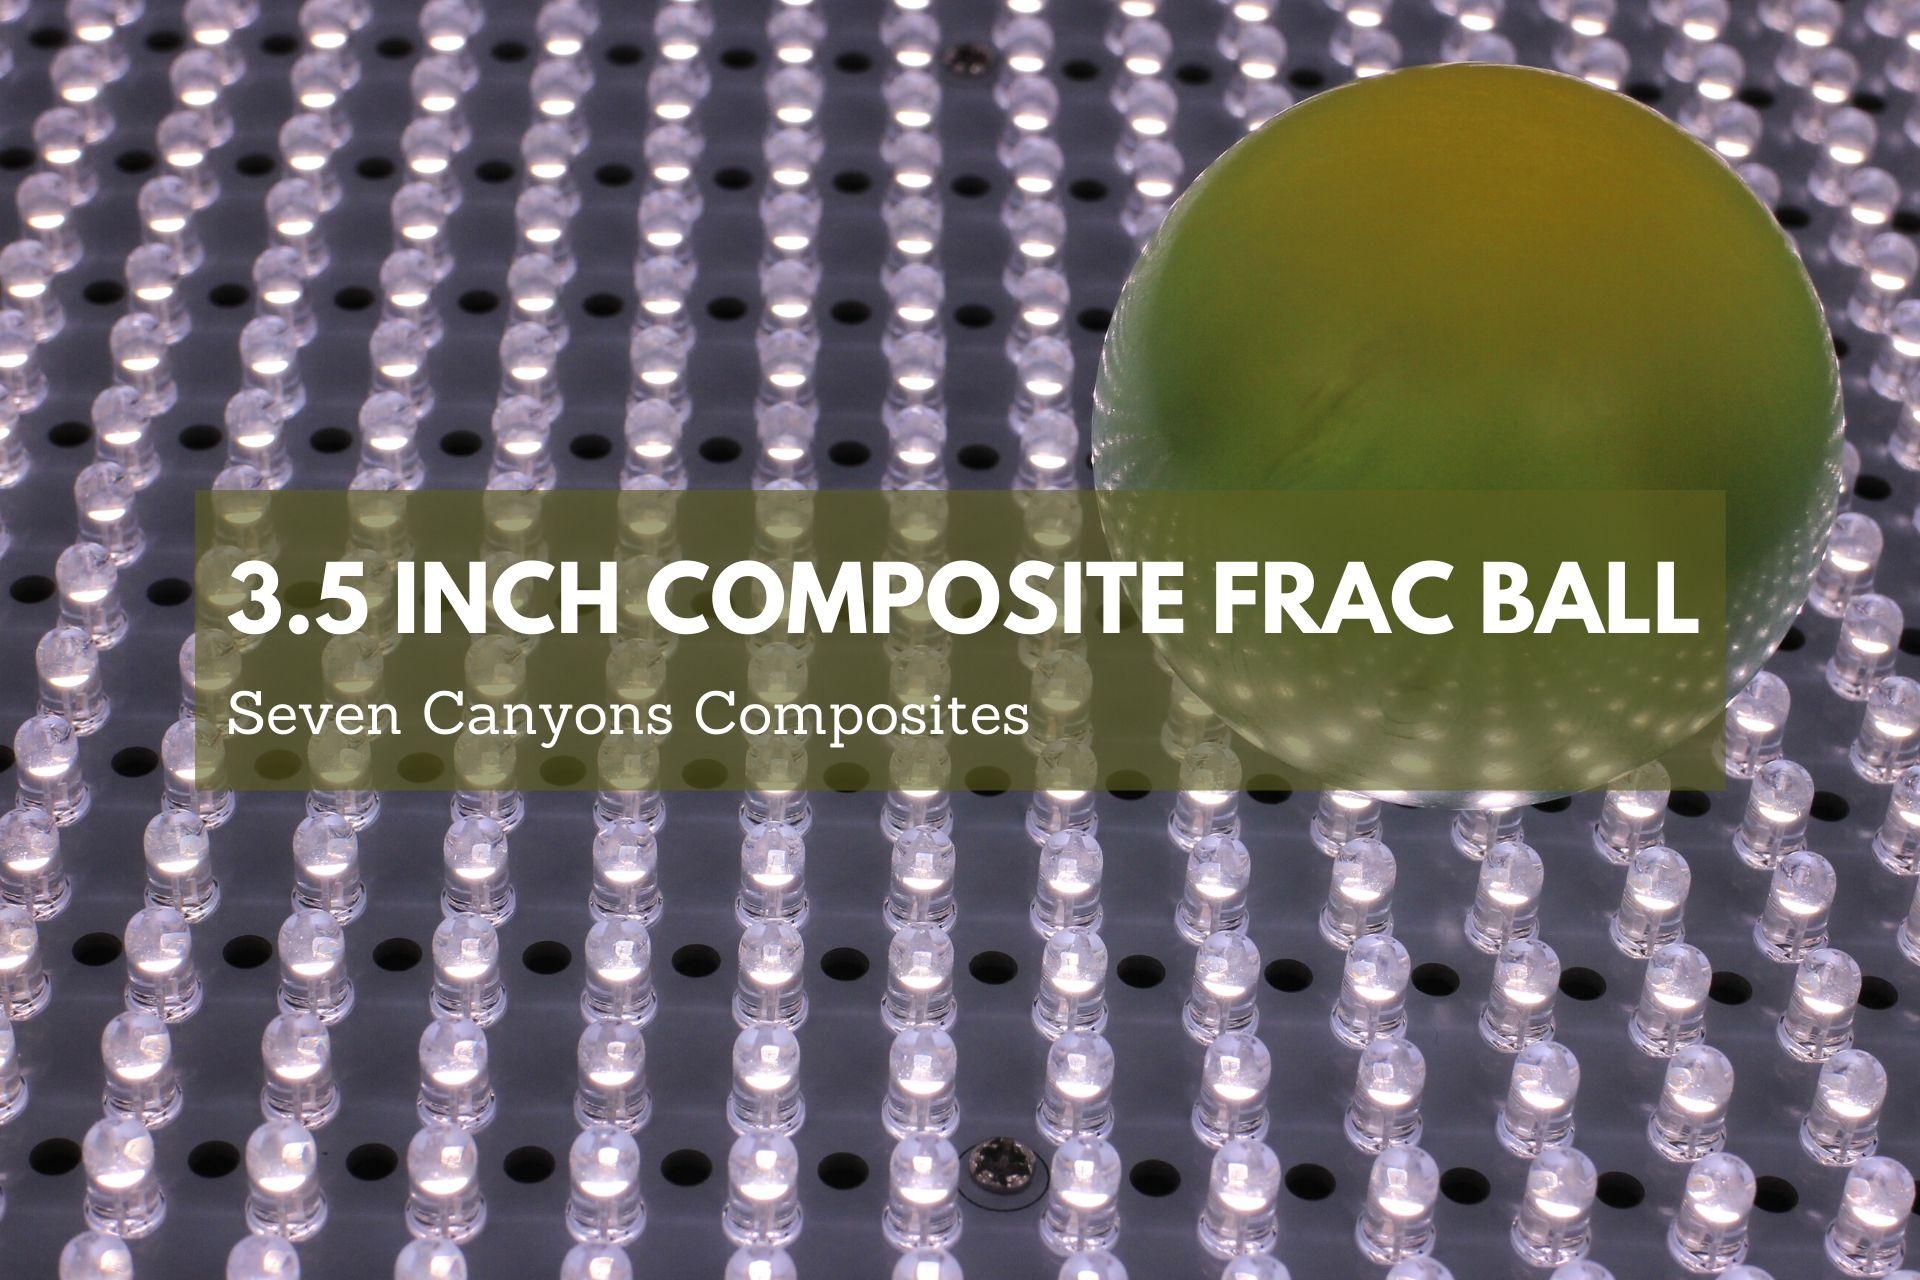 3.5 Inch Composite Frac Ball